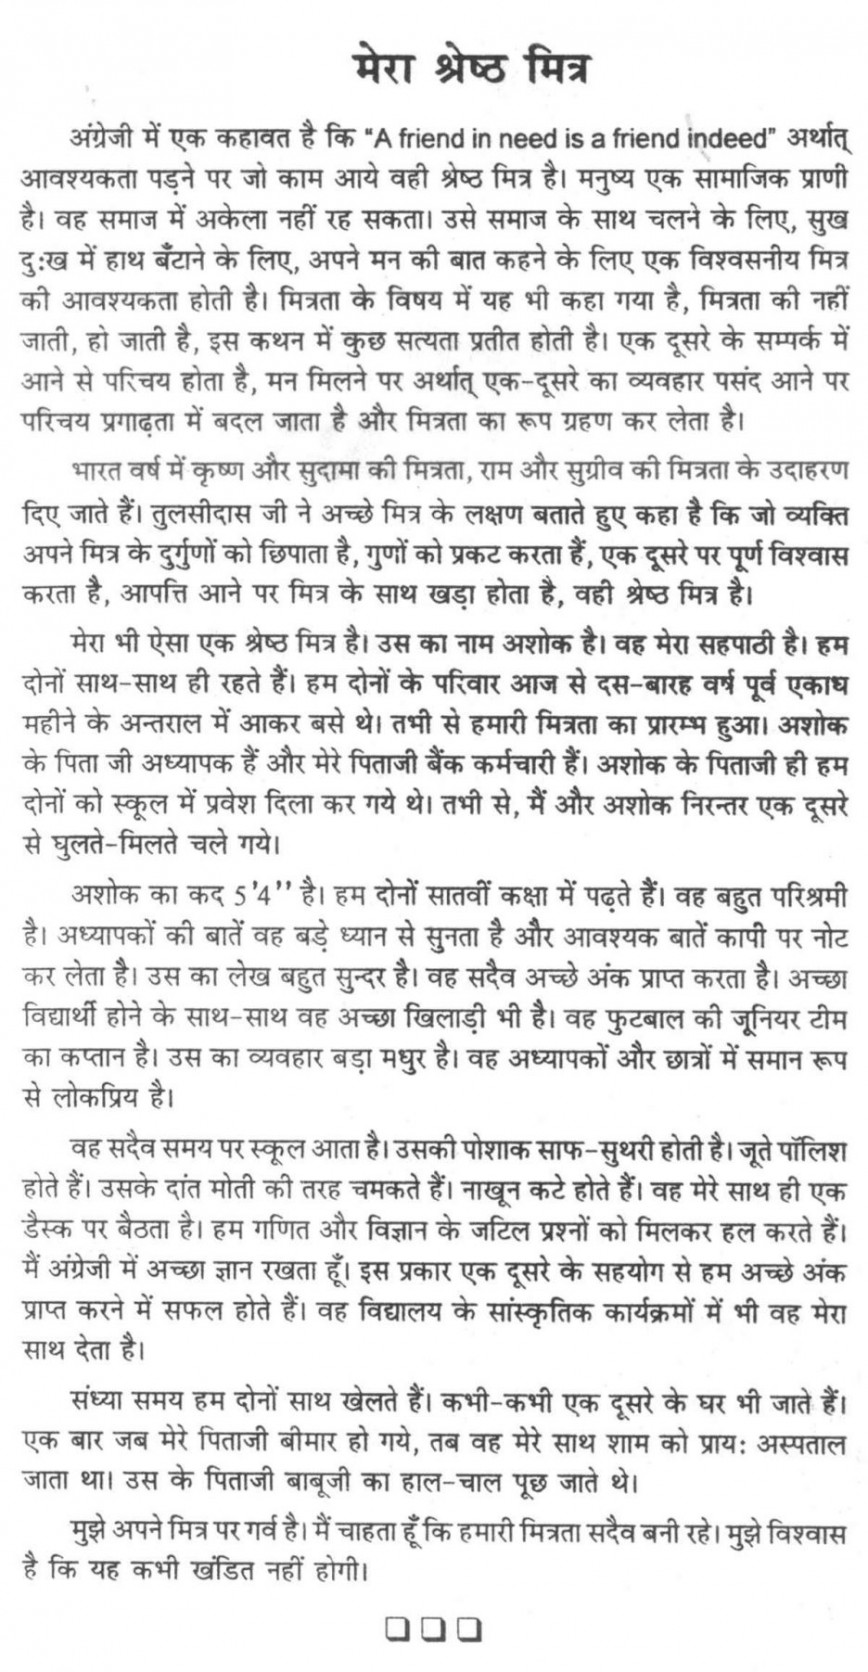 003 Essay Example Qualities Of Good Friends Friend Thumb Teacher Great Characteristics Pdf In Hindi Three Free Language Urdu Amazing A Conclusion Spm 868